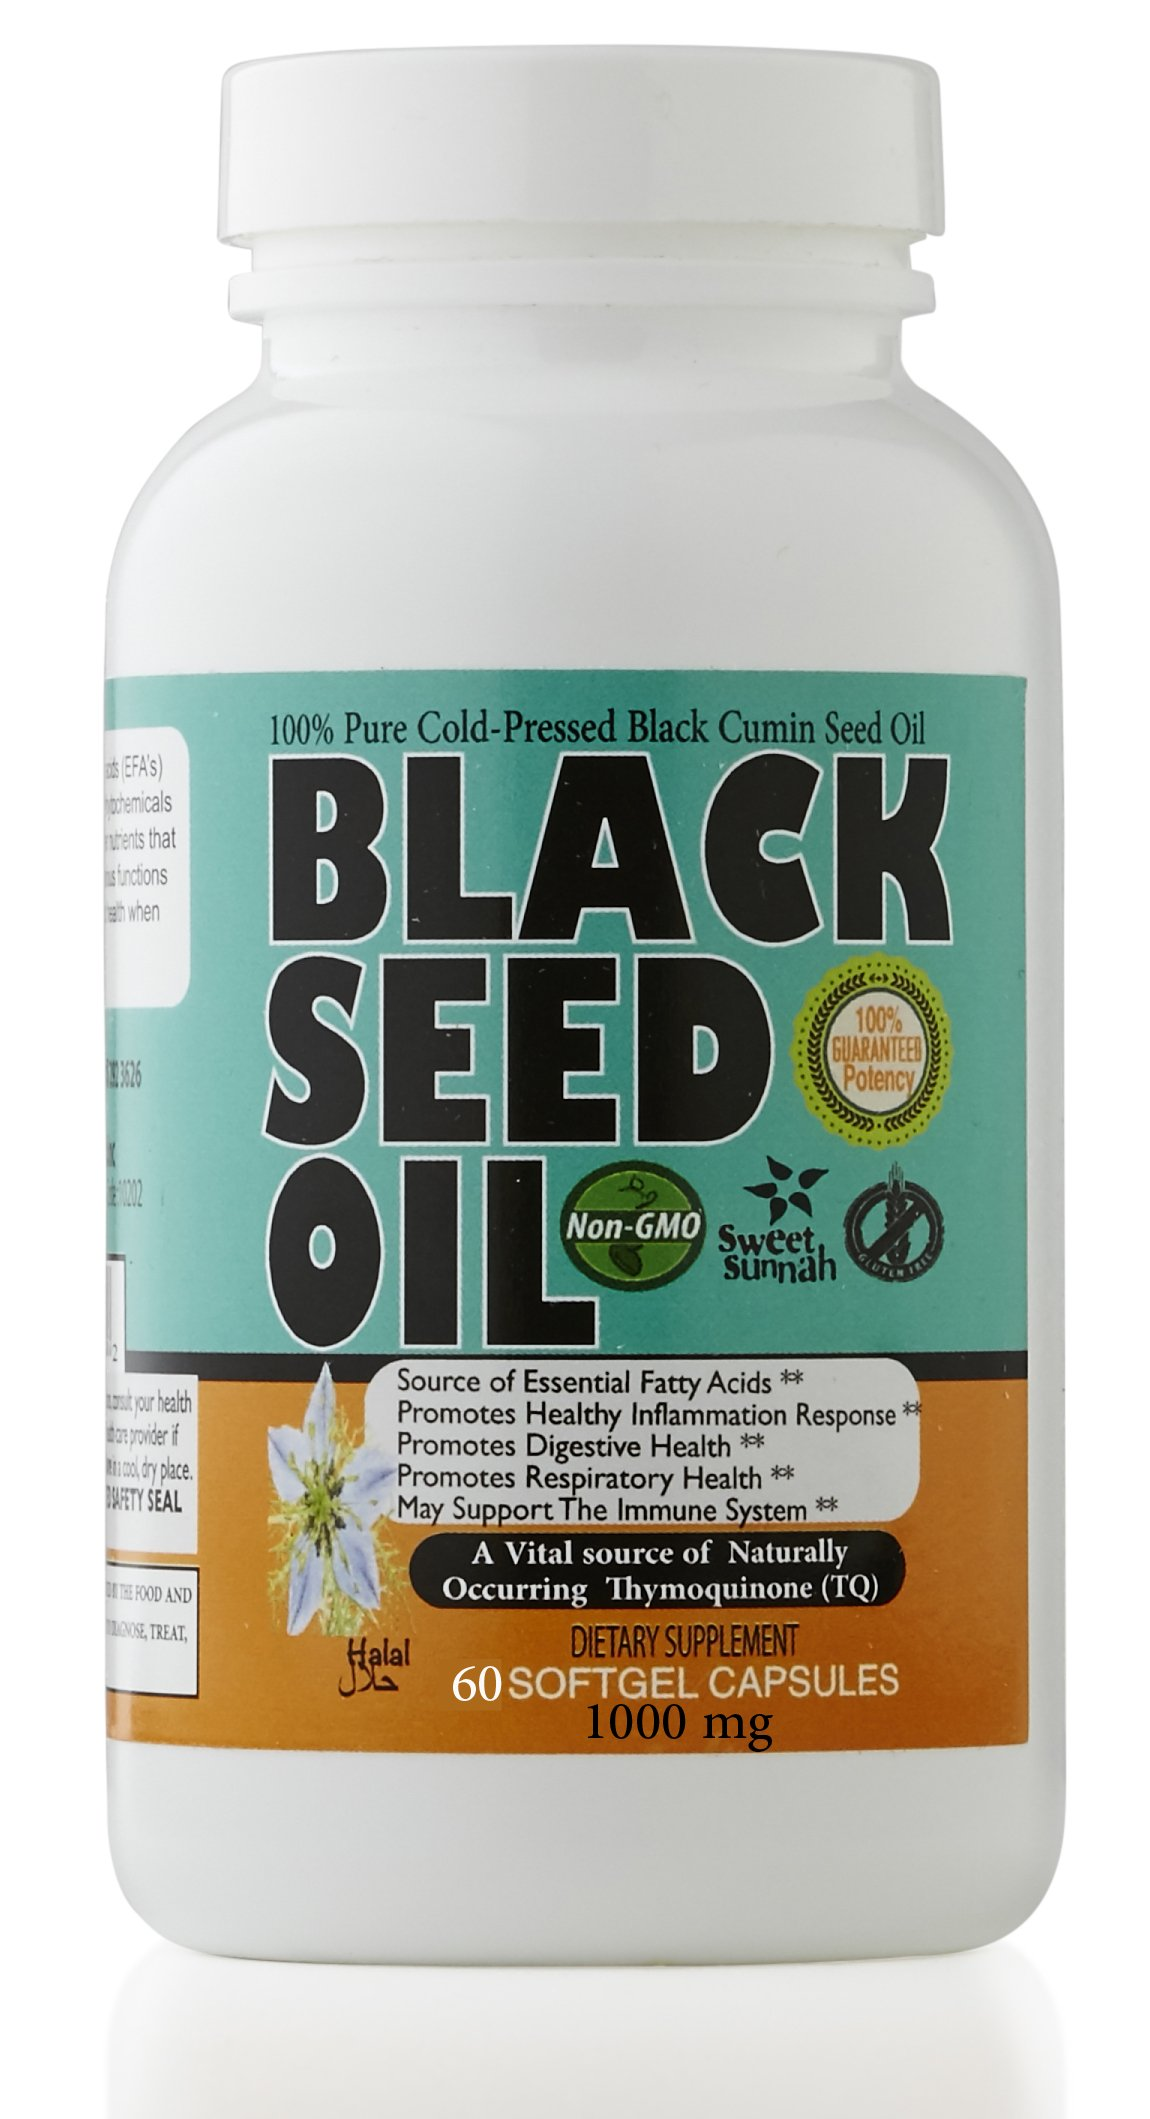 Premium Black Seed Oil Softgel Capsules 60 Capsules (1000mg each) by Sweet Sunnah